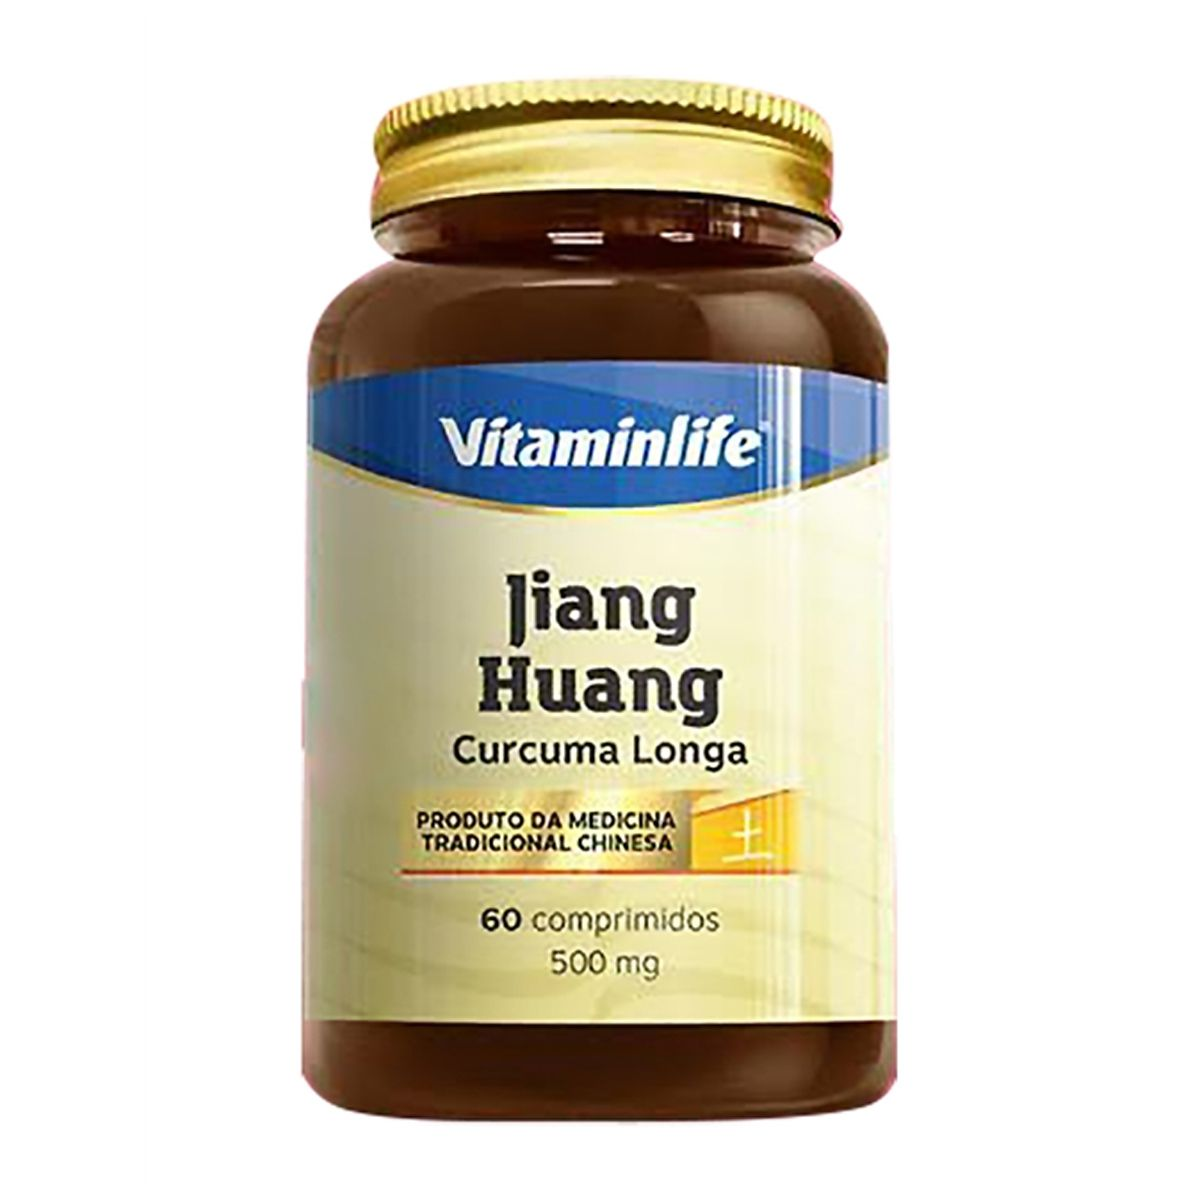 Jiang Huang Curcuma Longa - 60 Cápsulas - Vitamin Life